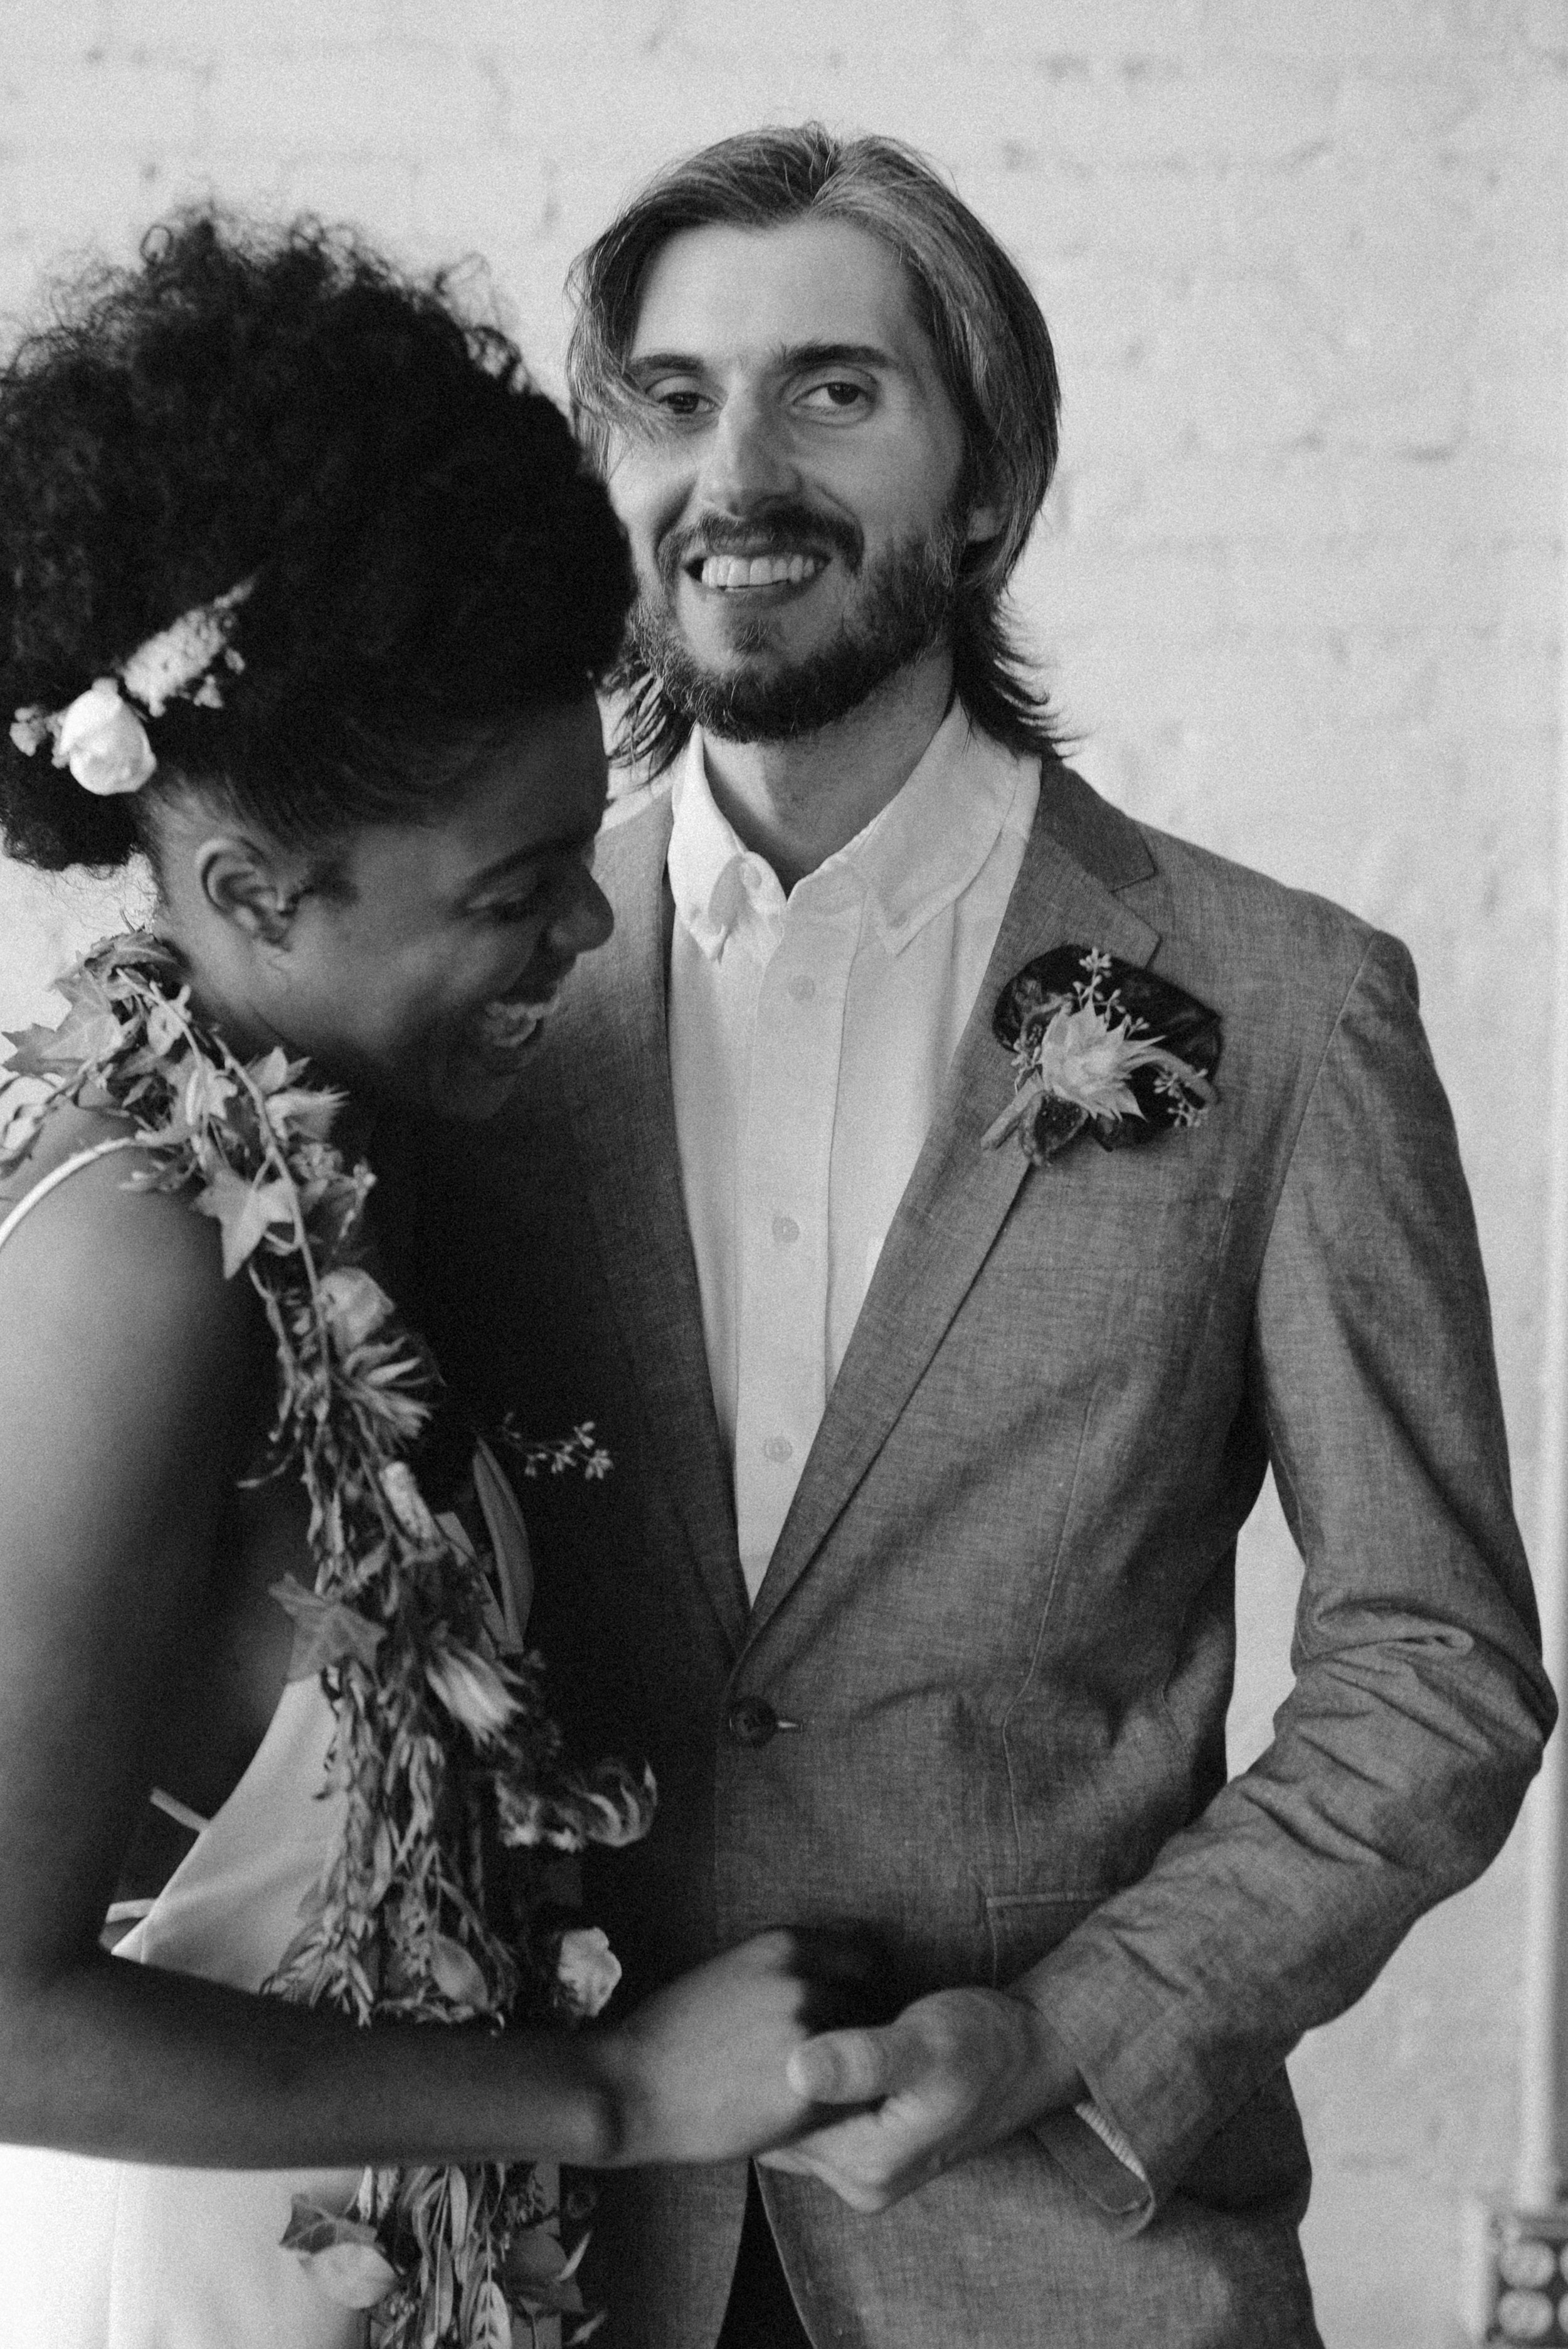 haus-820-minimal-editorial-wedding-styled-shoot-53.jpg